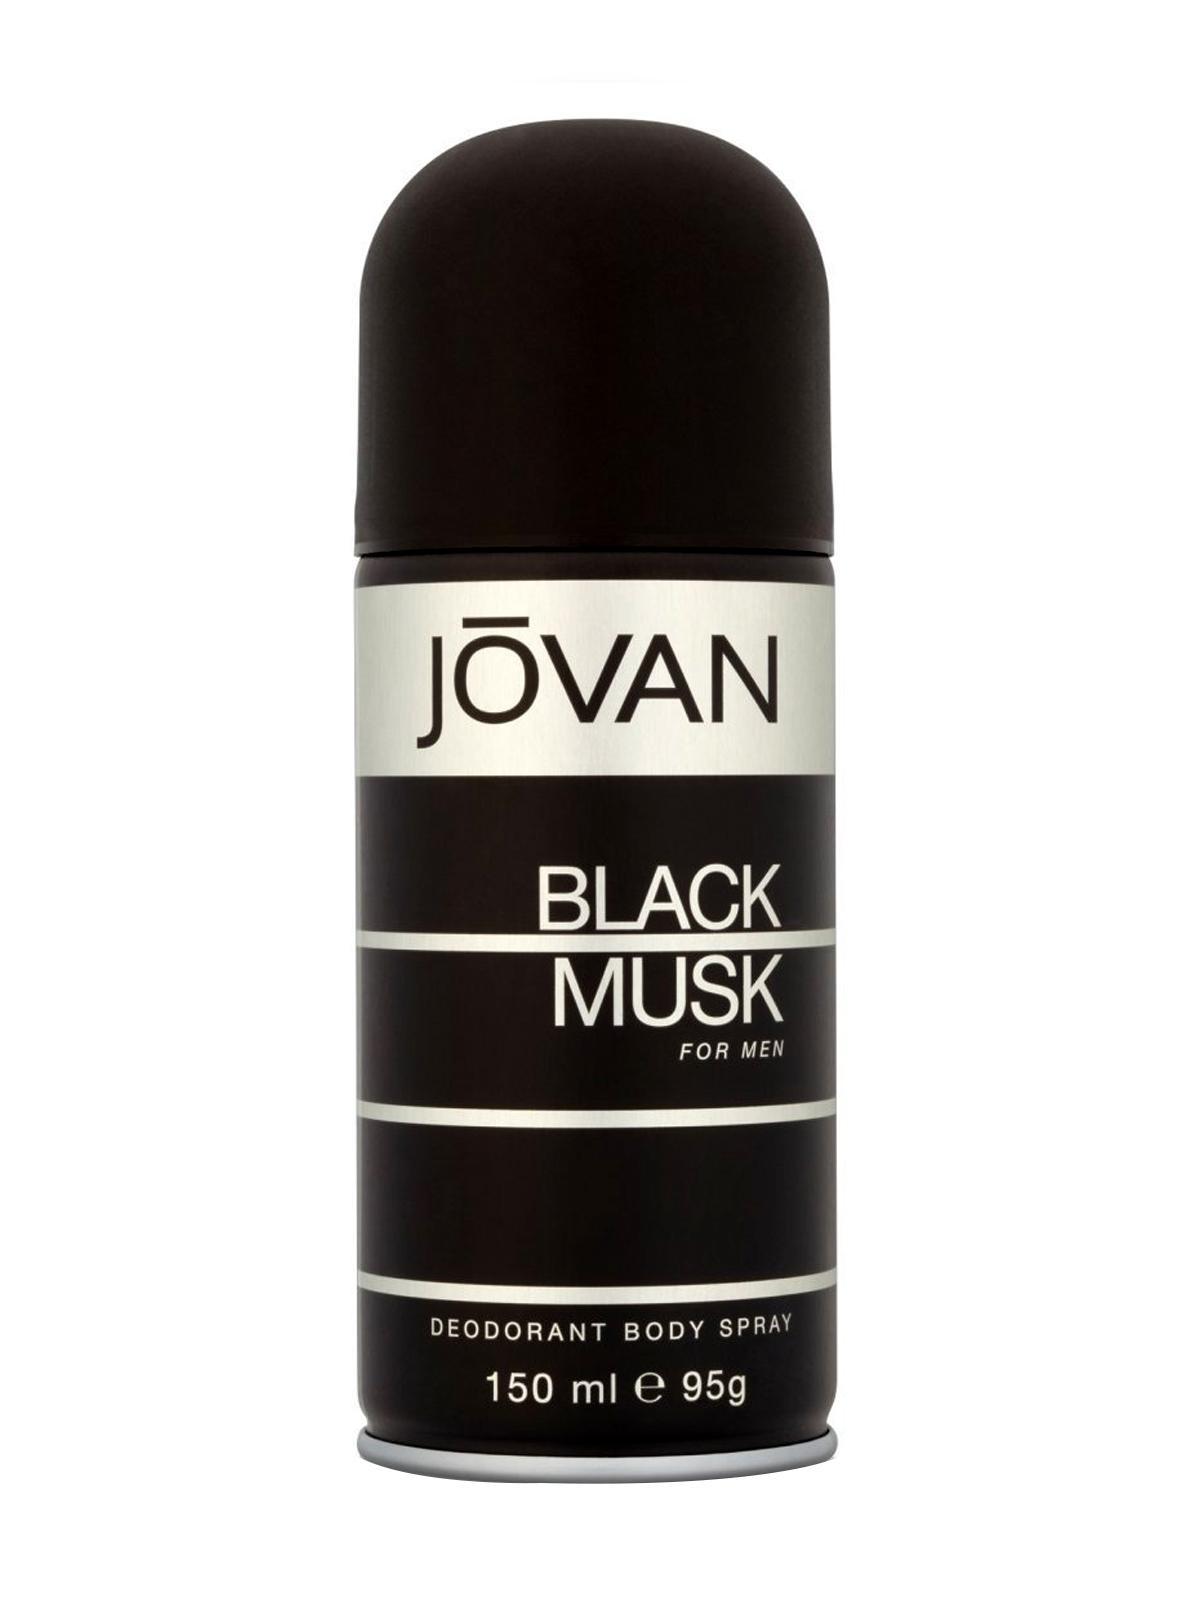 Jovan Black Musk For Women Body Spray 150ML